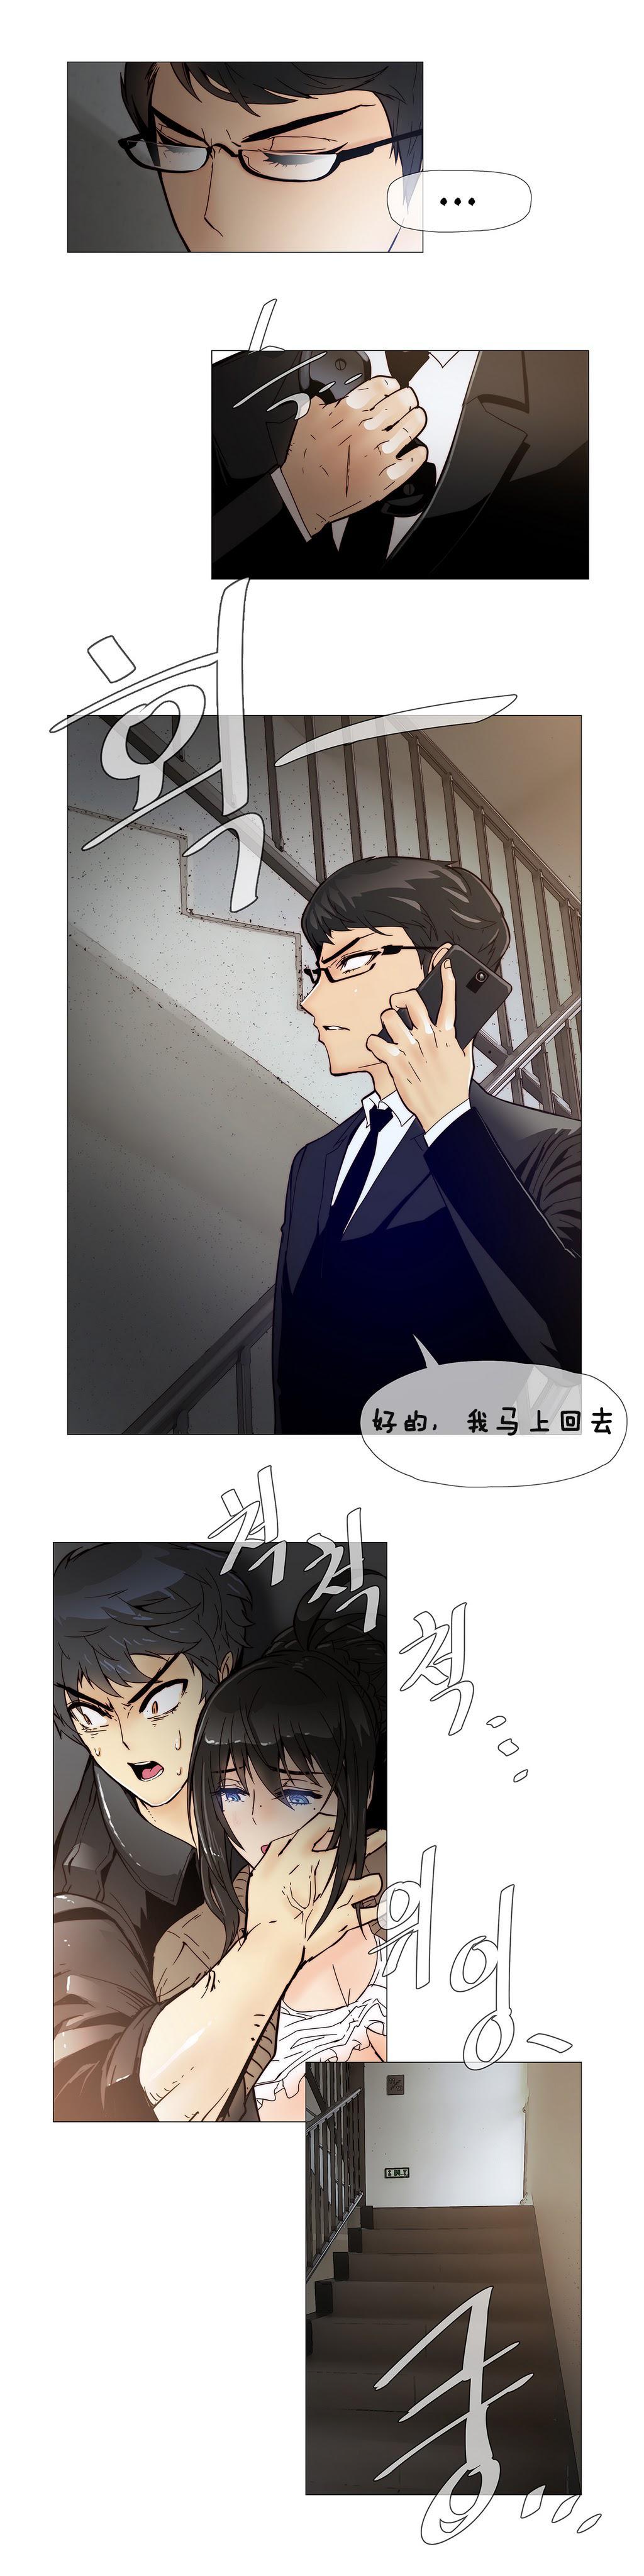 HouseHold Affairs 【卞赤鲤个人汉化】1~21话(持续更新中) 149